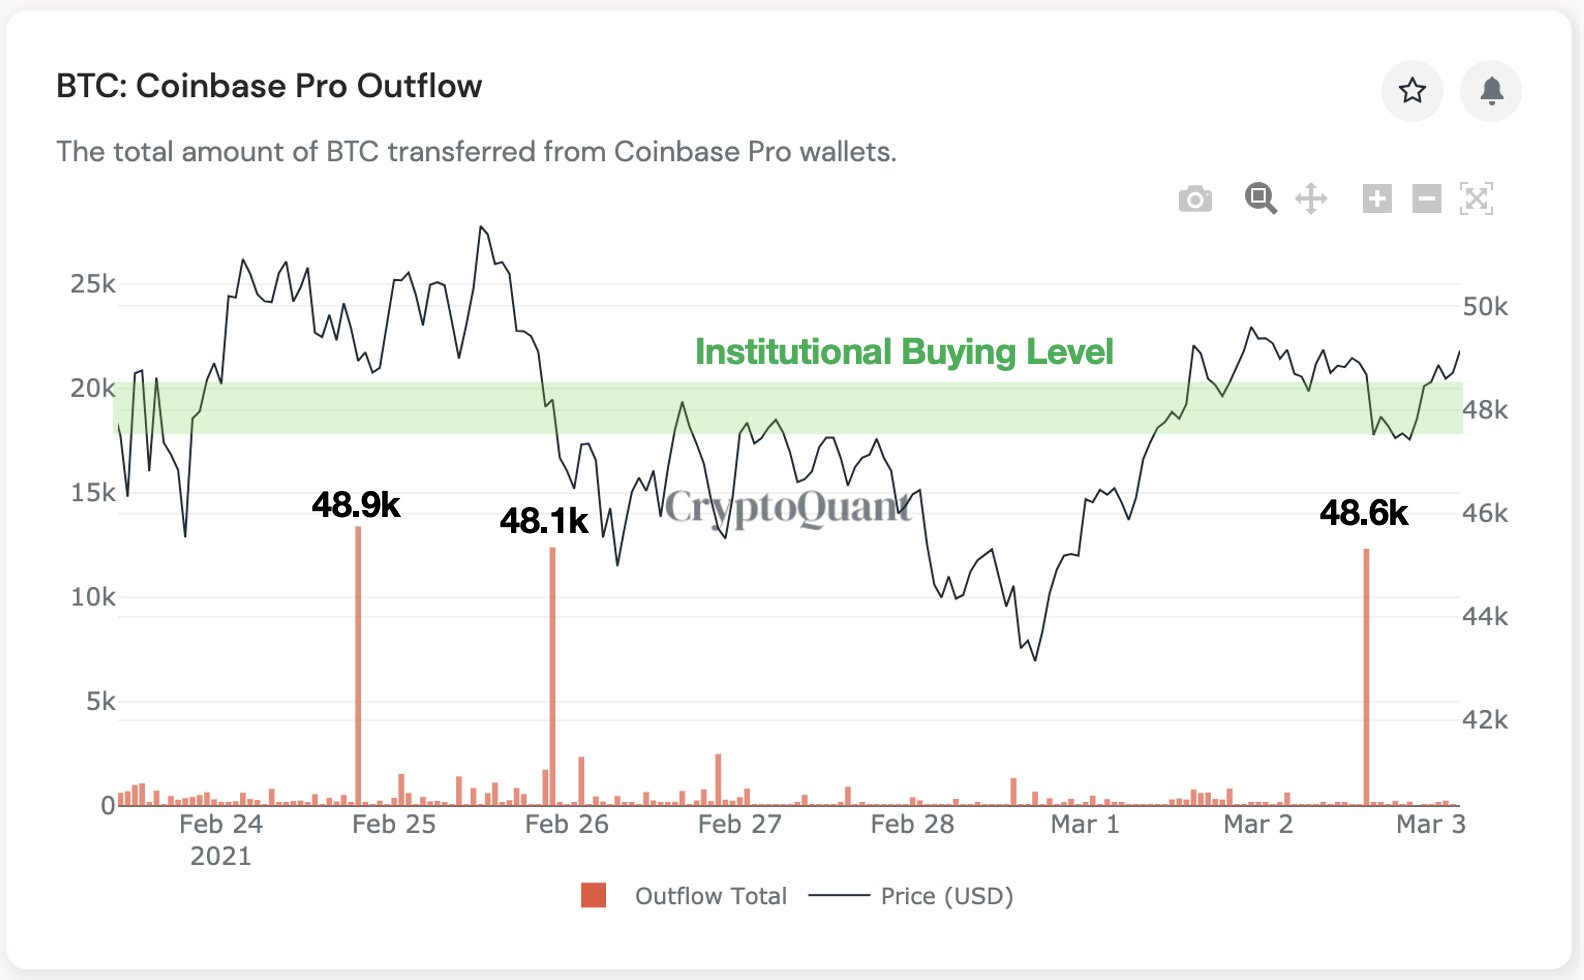 Giao dịch bitcoin trên Coinbase Pro. (Nguồn: Ki Young Ju/ Twitter)